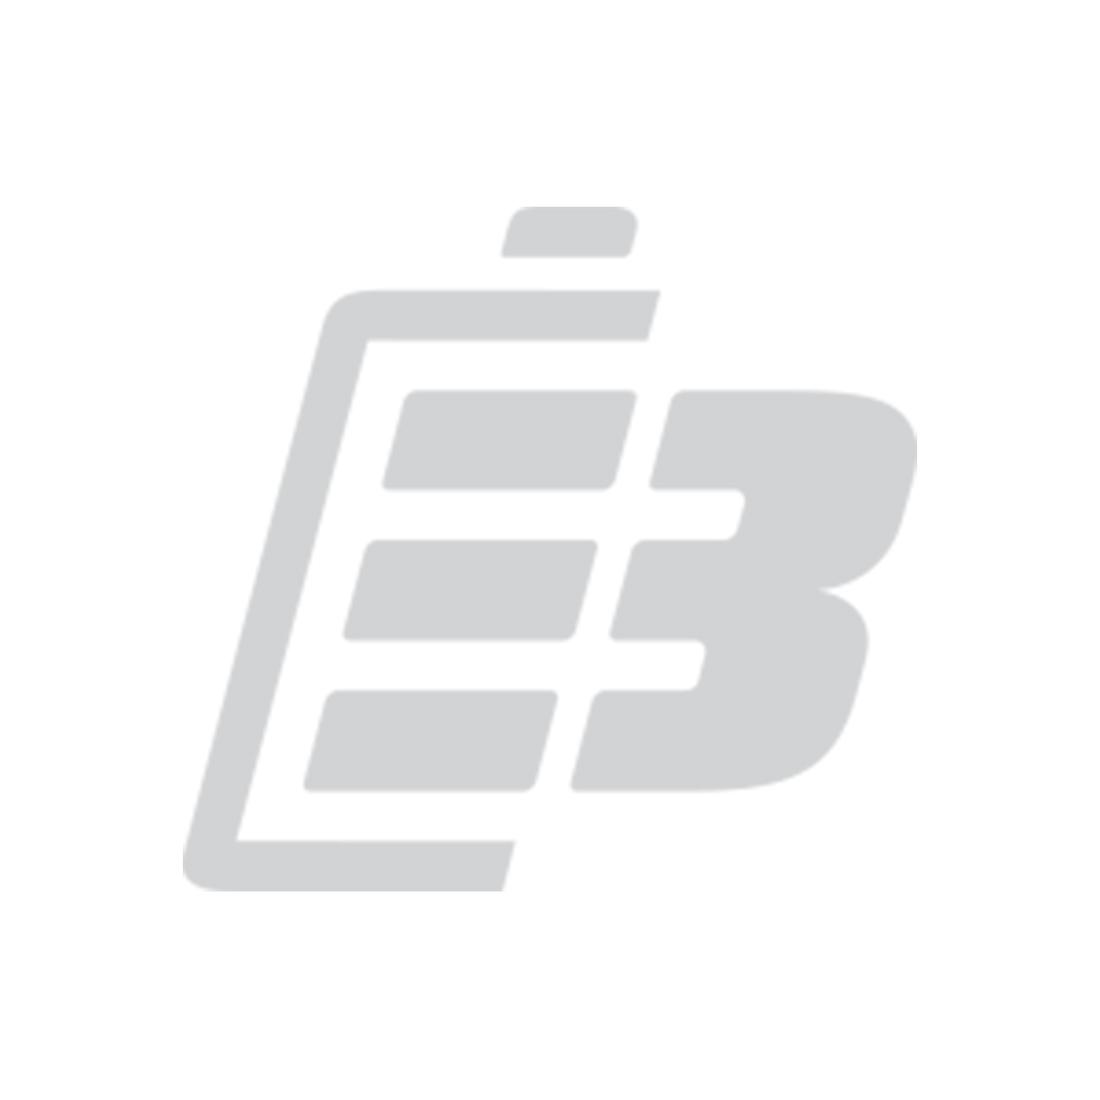 384 - 392 Energizer button Battery 1